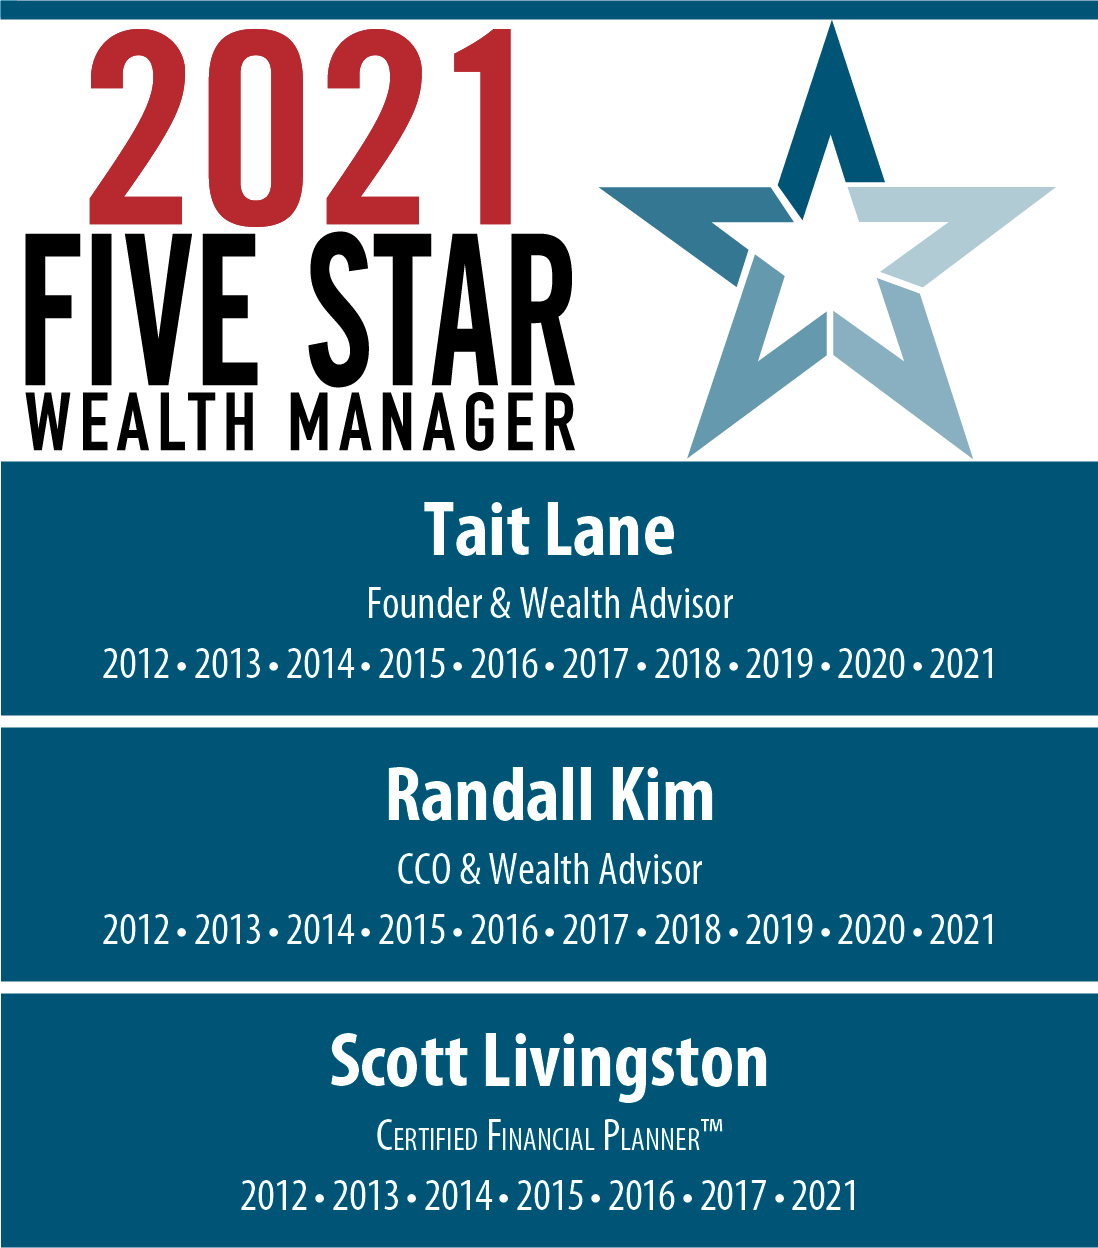 2021 Five Star Wealth Managers, Tait Lane, Randall Kim, Scott Livingston